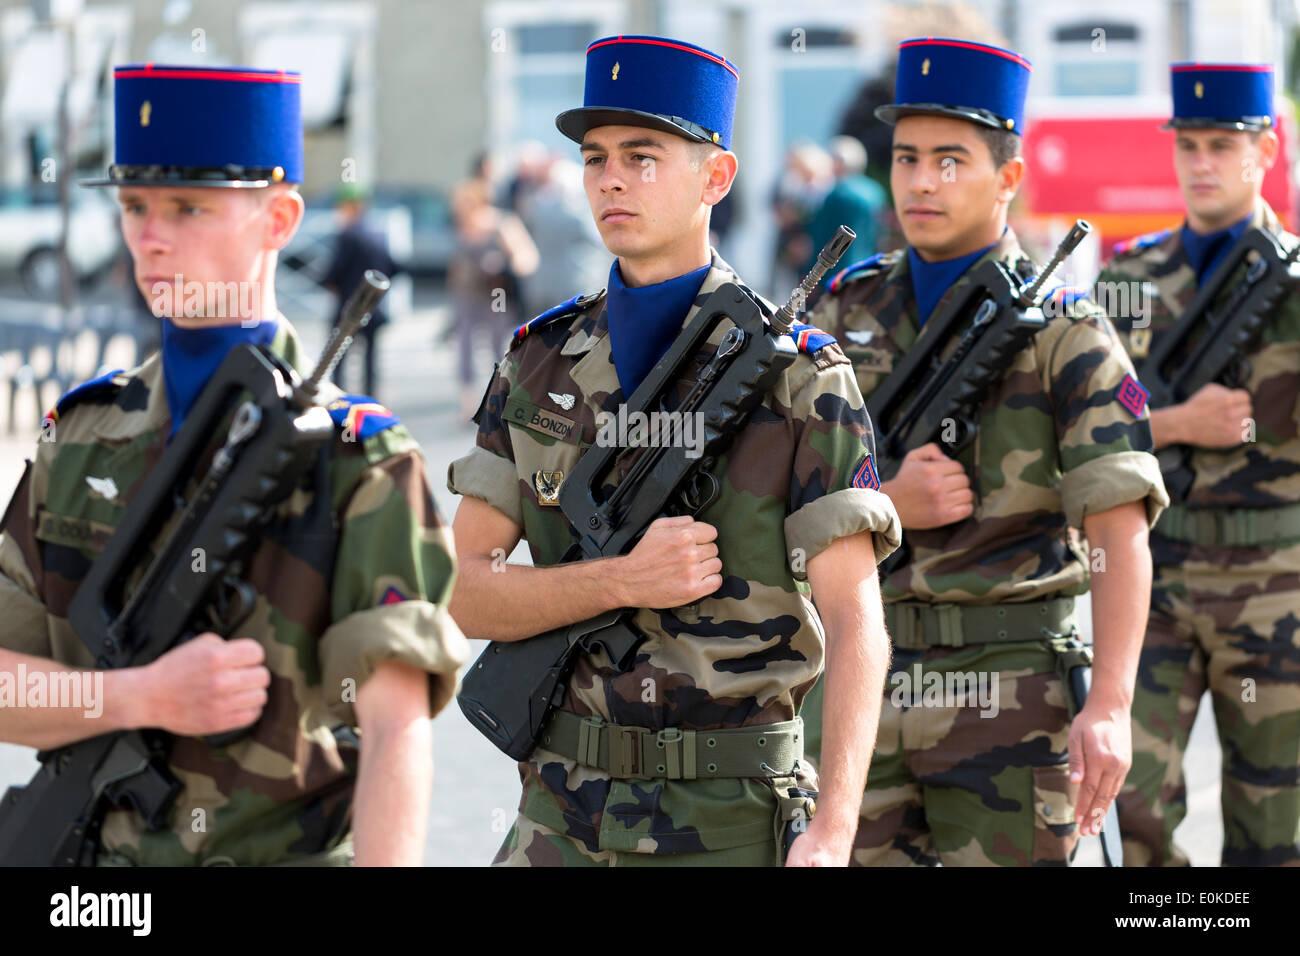 Old French Army Uniform Stockfotos Old French Army Uniform Bilder